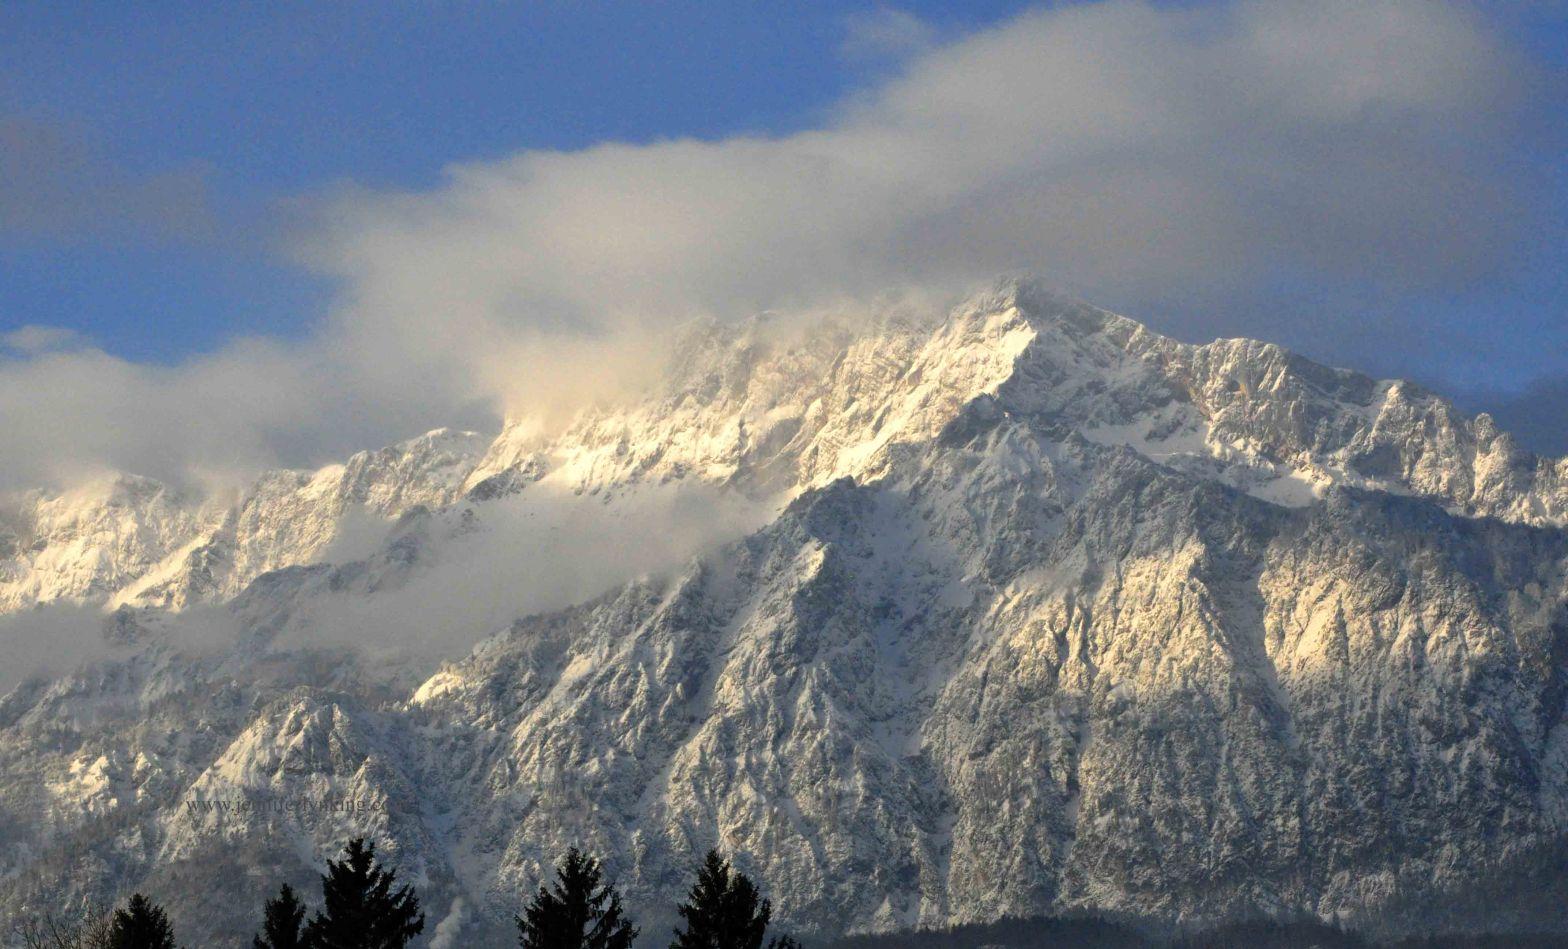 Mountain Peak in Austrian Alps